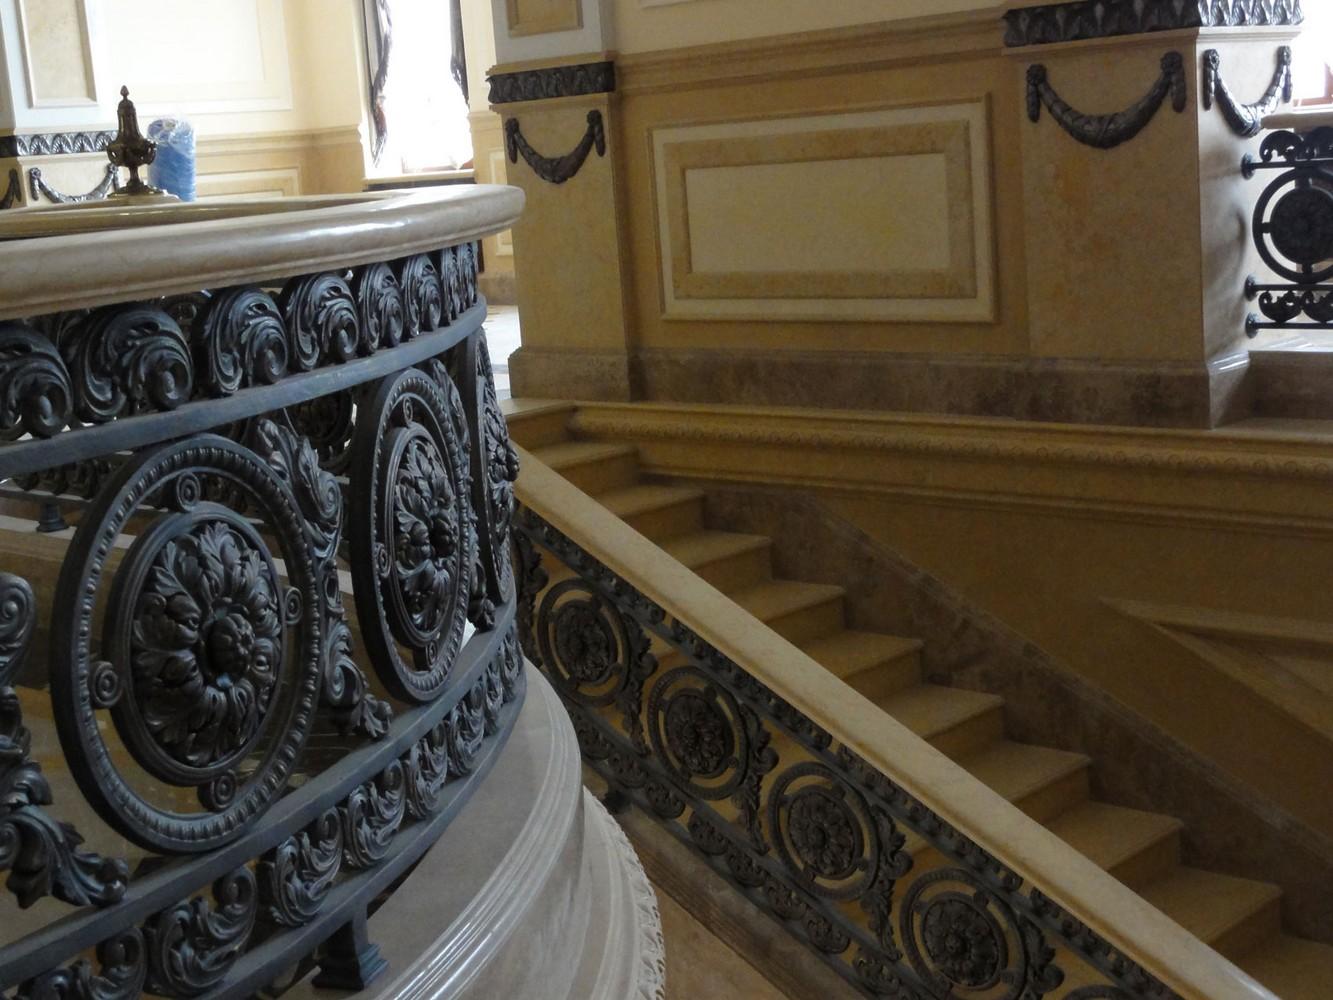 Лестница из чугуна. Фрагмент